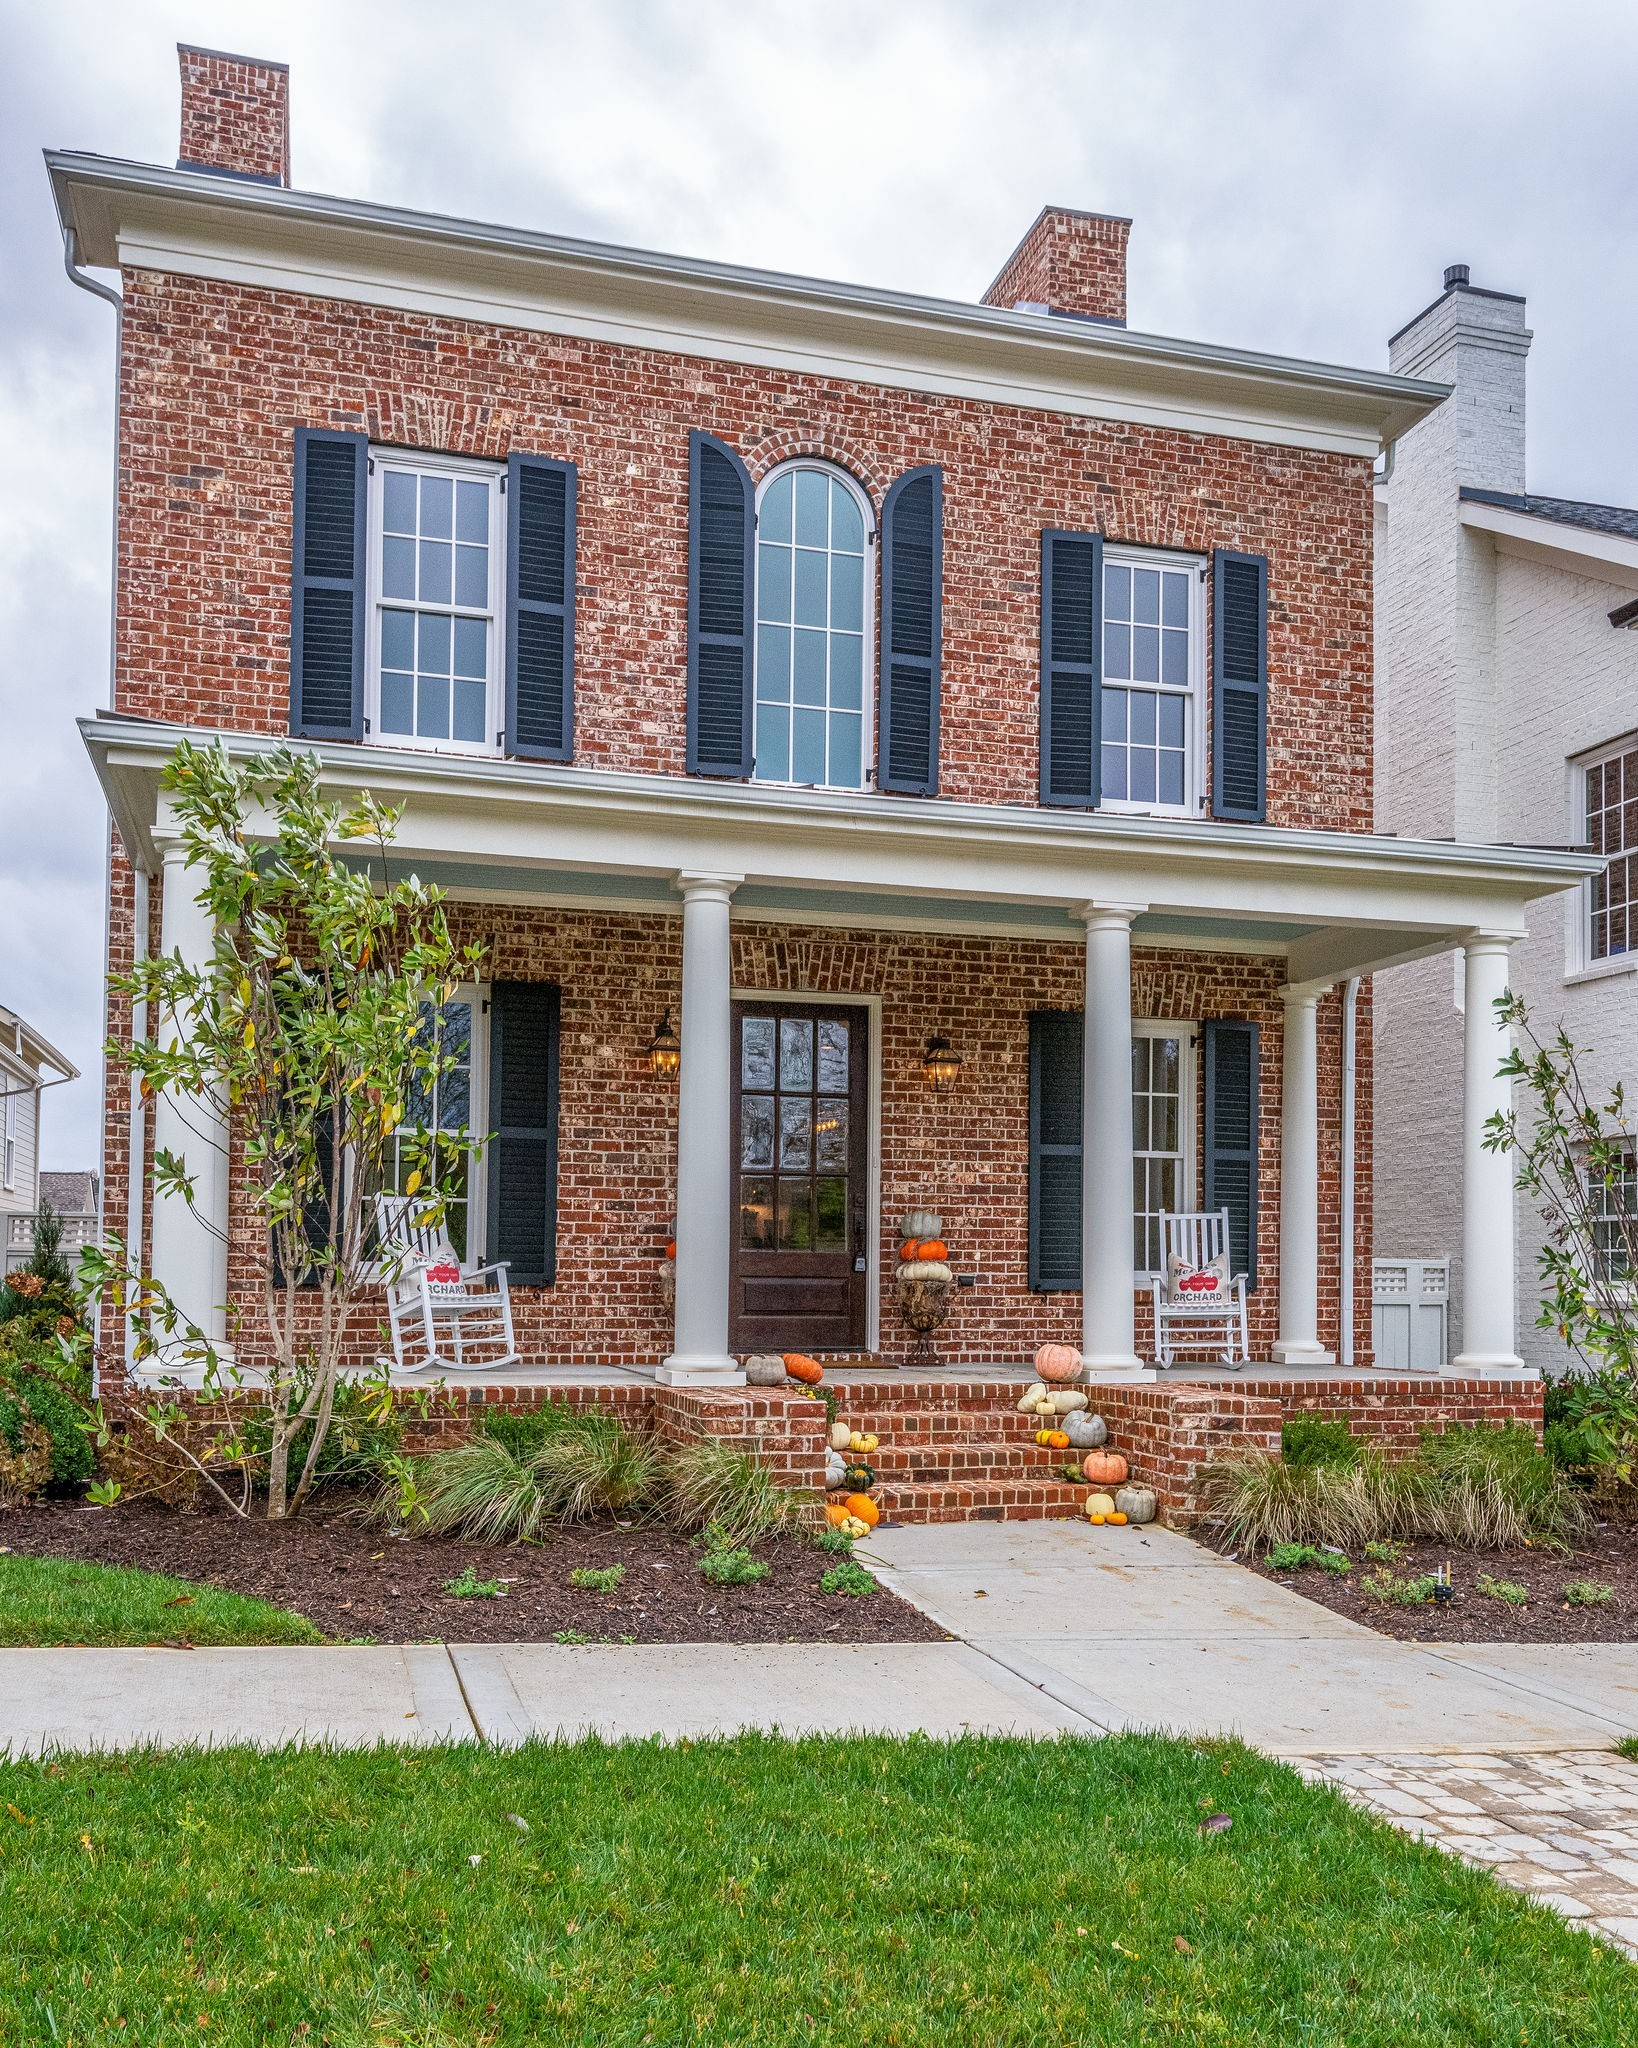 233 Stephens Valley Blvd (105), Nashville, TN 37221 - Nashville, TN real estate listing